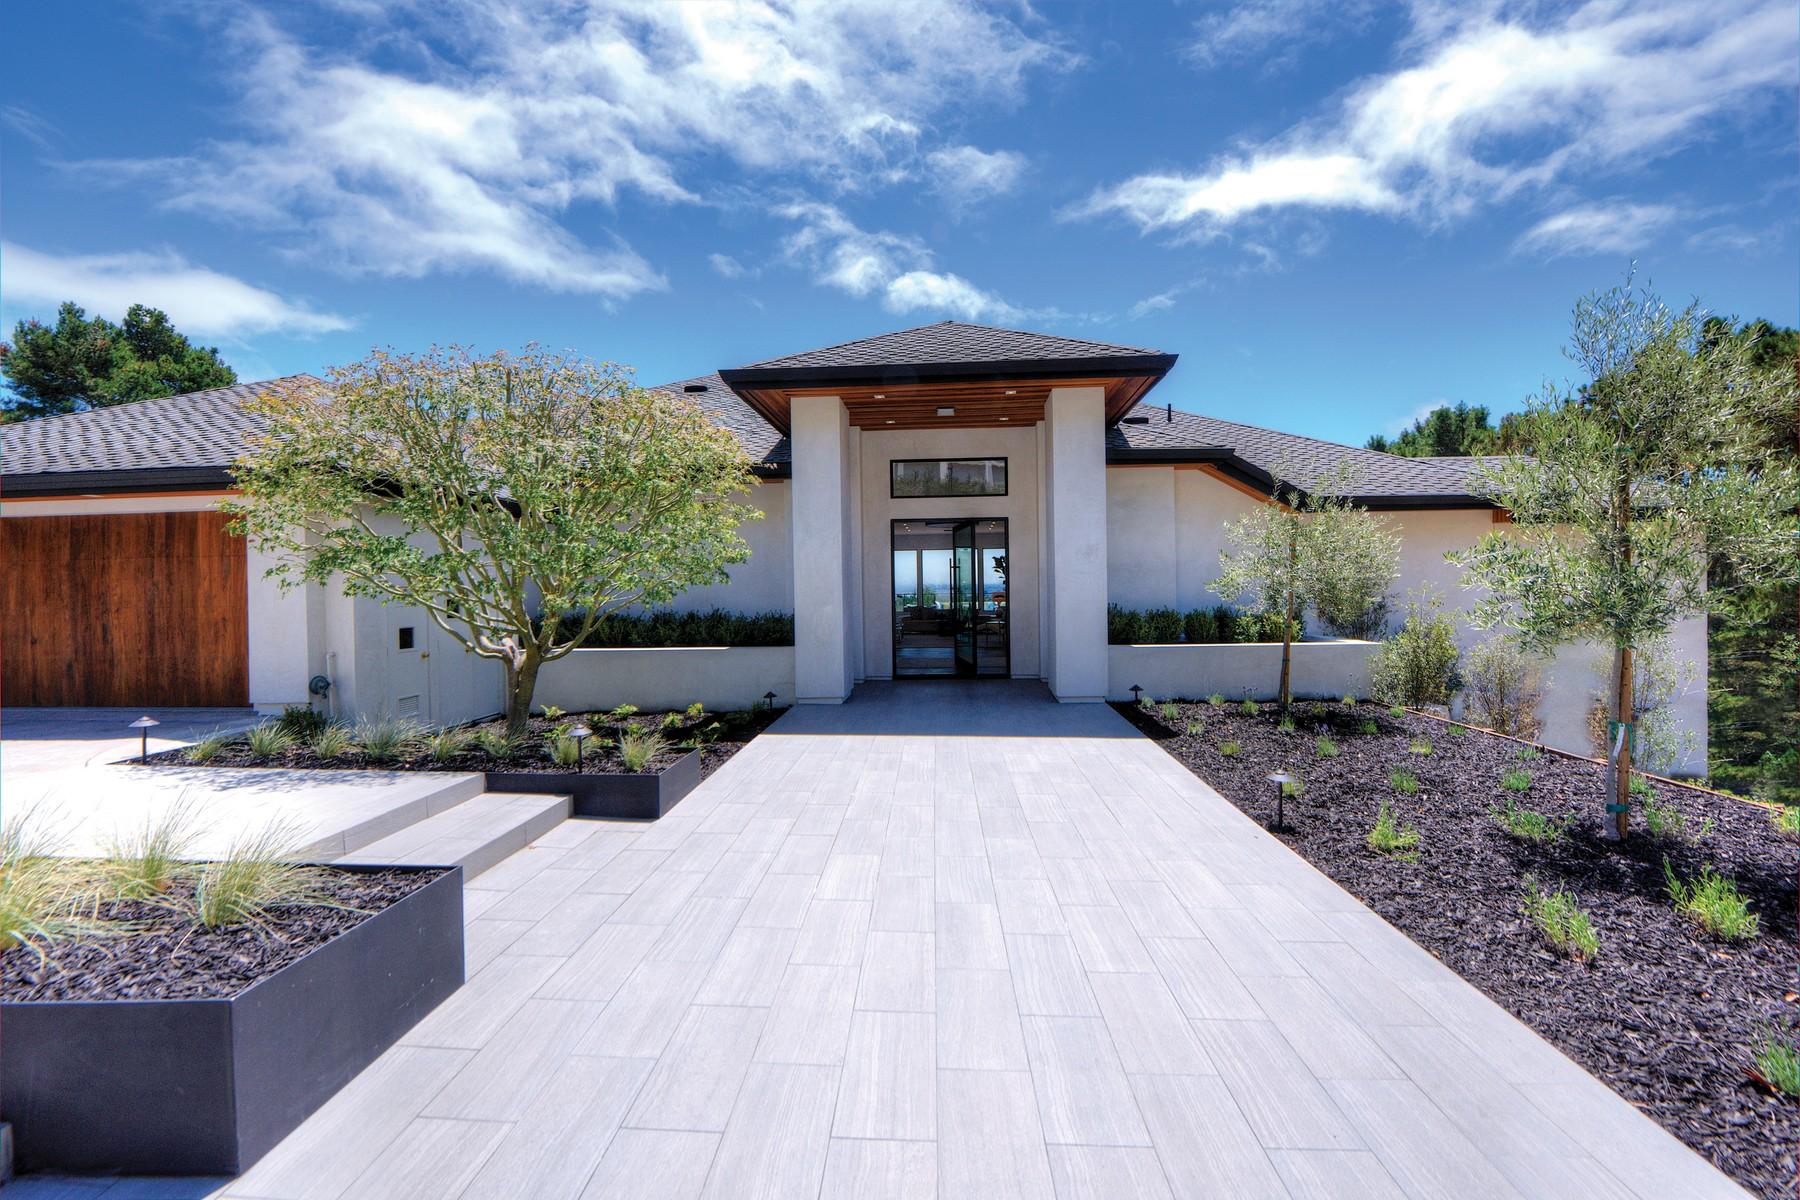 Single Family Home for Sale at Tiburon Estate 30 Meadow Hill Drive Tiburon, California 94920 United States